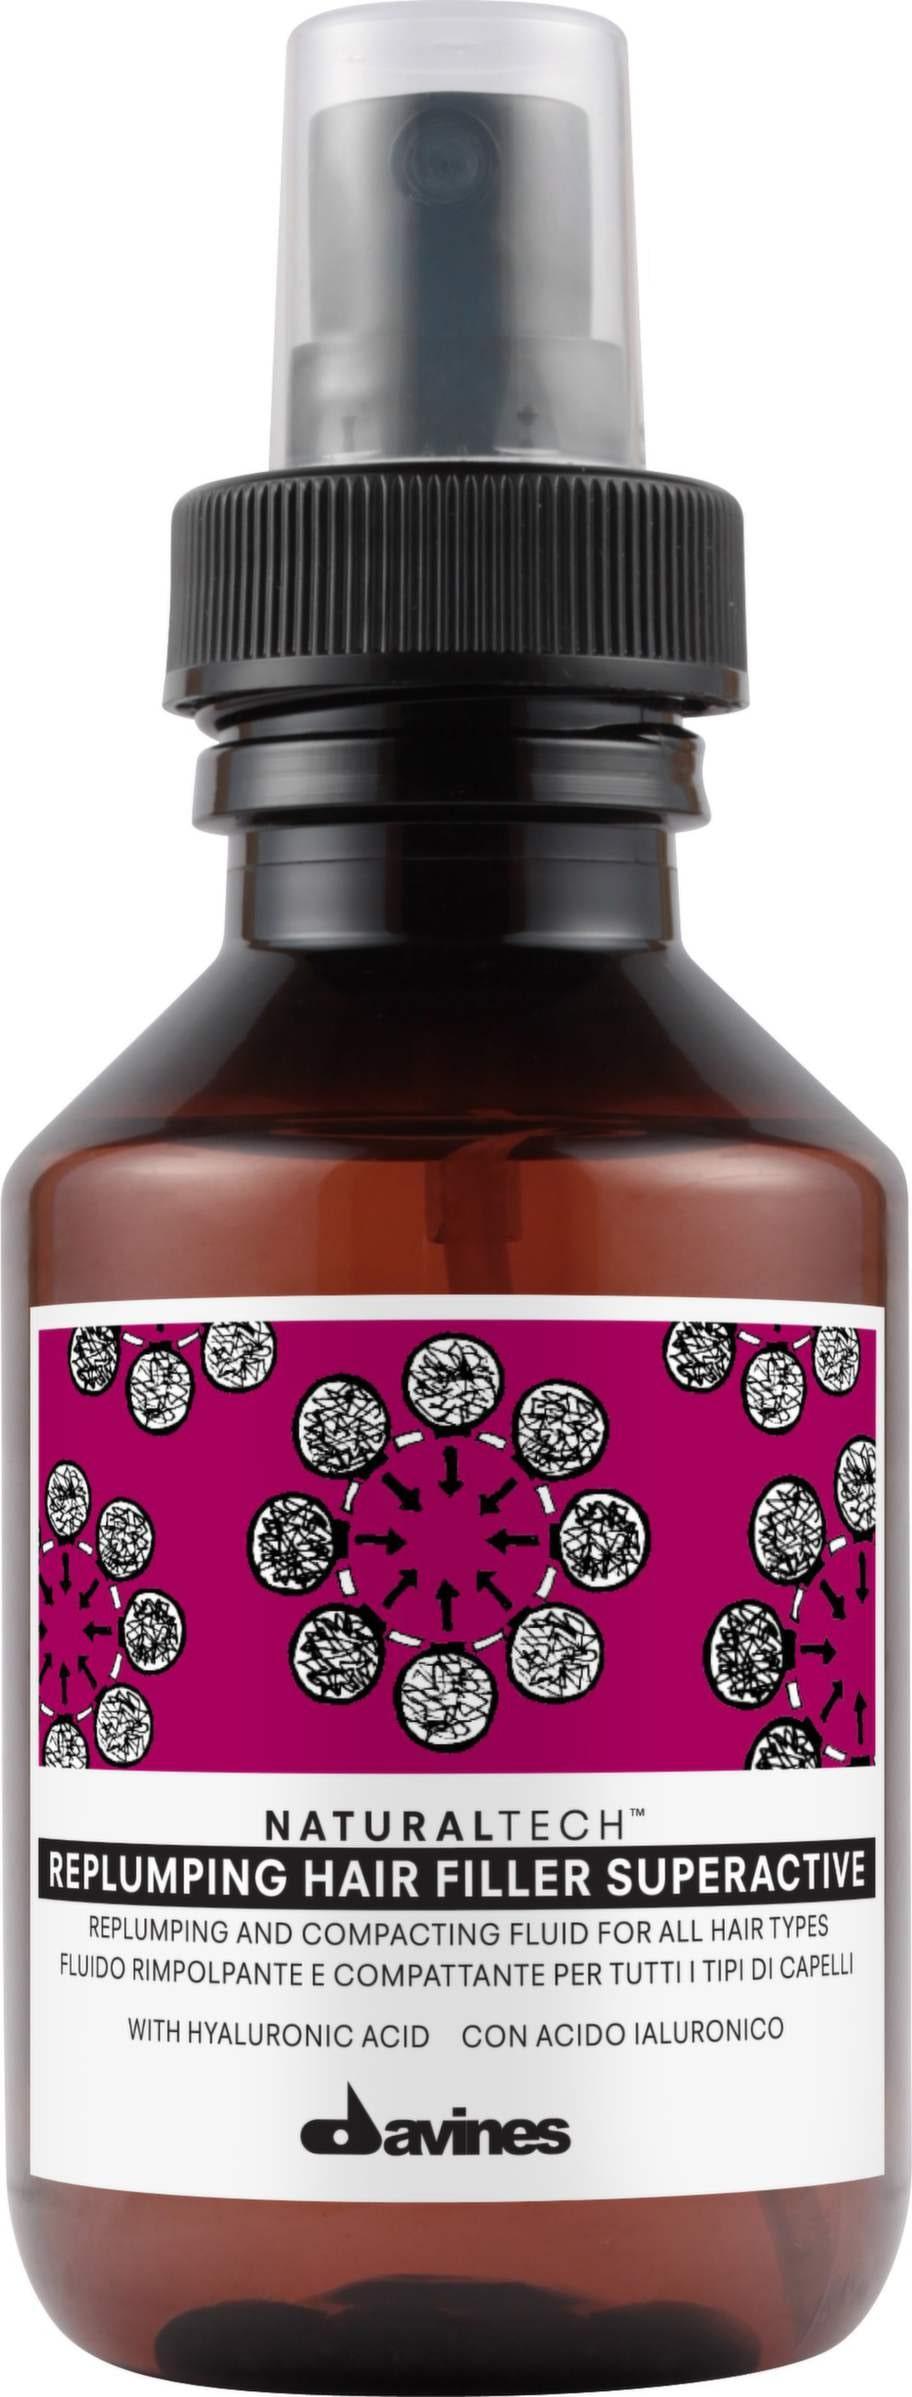 Replumping hair filler superactive, 239 kronor/ 250 ml samt 249 kronor/ 100 ml. davines.se